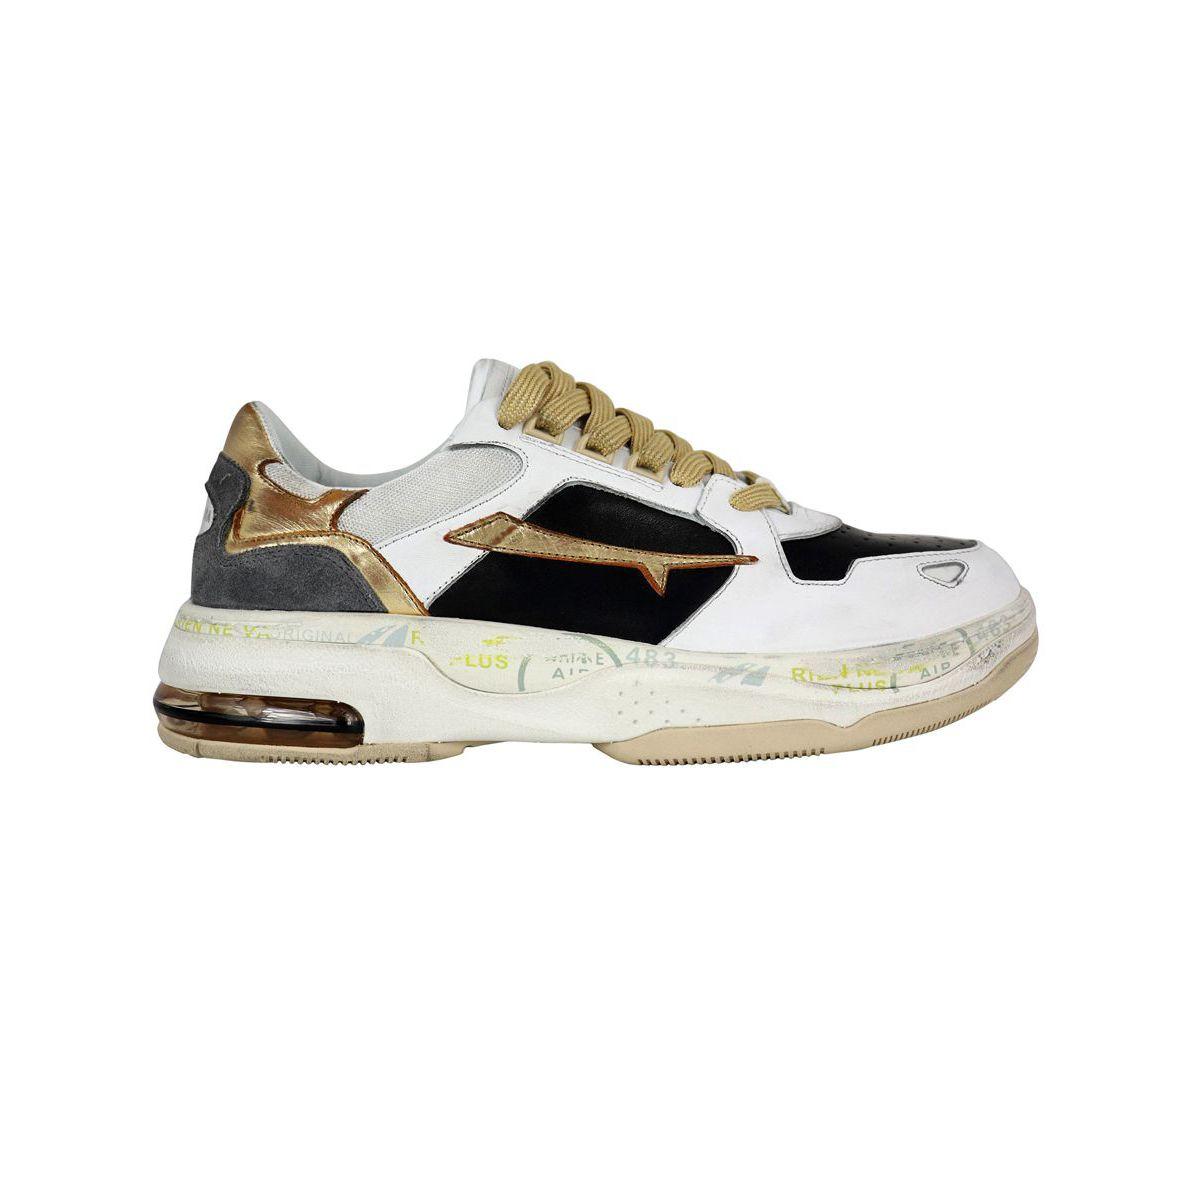 Drake sneakers White / gold Premiata